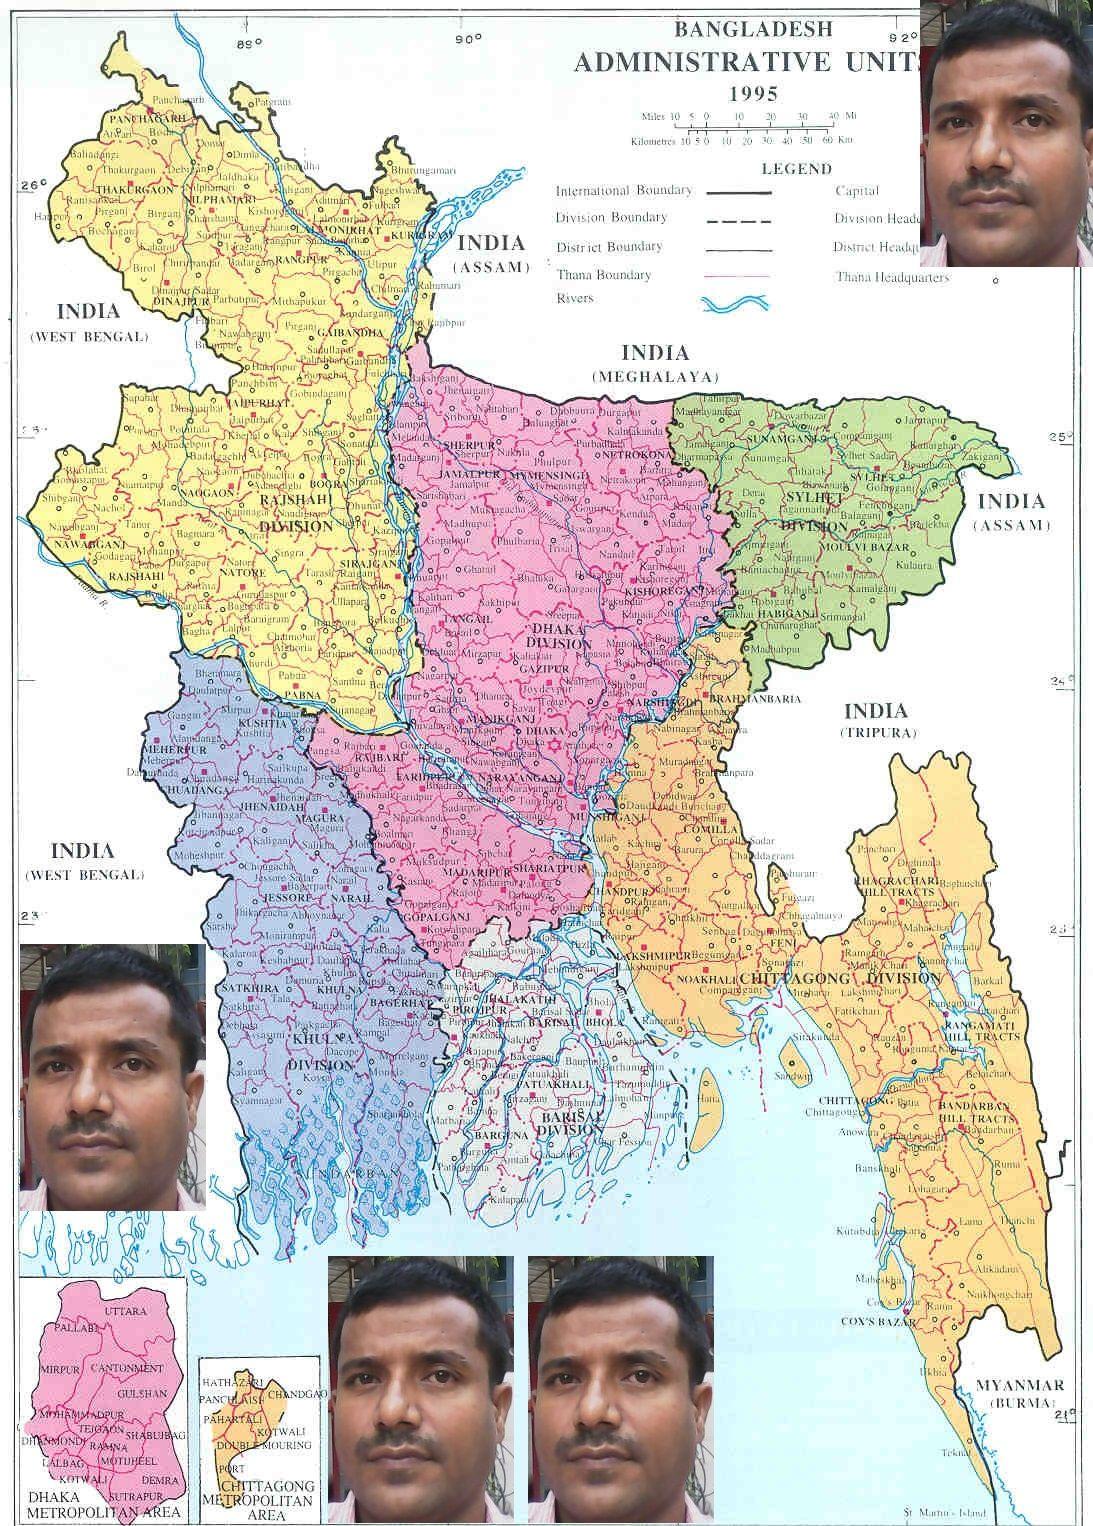 Hazrat Shahjalal International Airport Dac Map Asia Map Bangladesh Travel